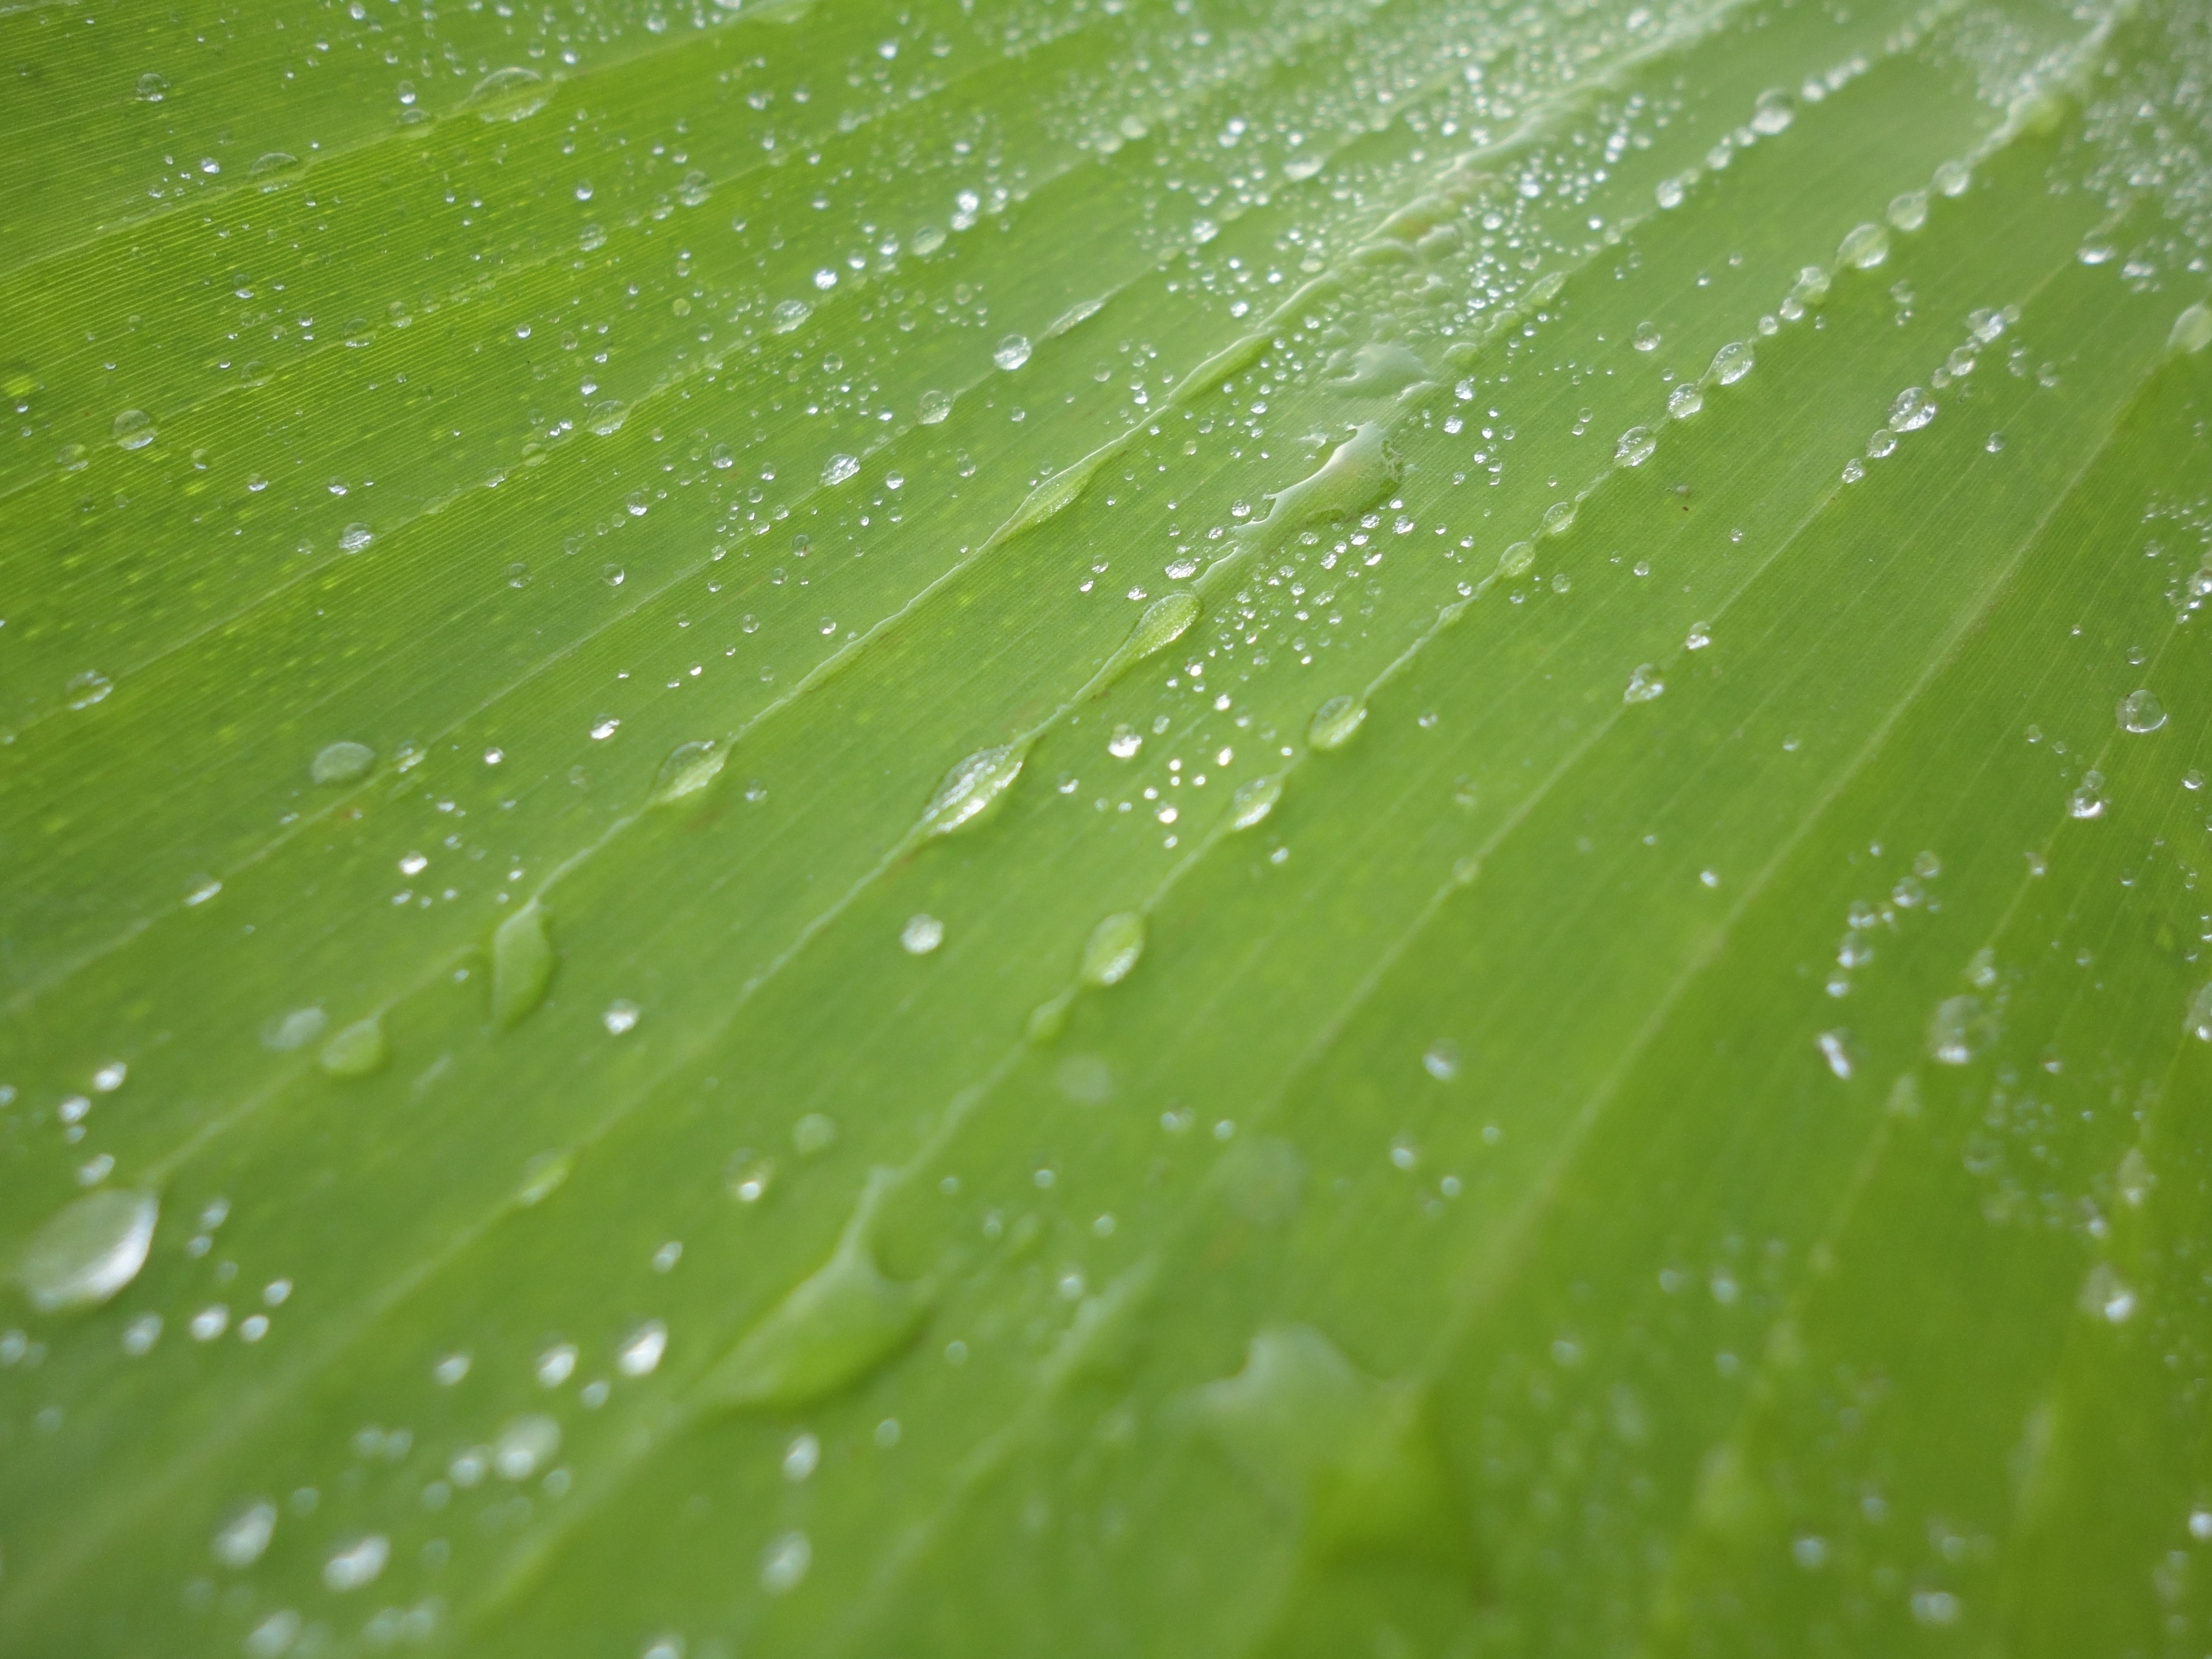 3d Wallpaper Water Drop Banana Leaf Images Free Pixelstalk Net